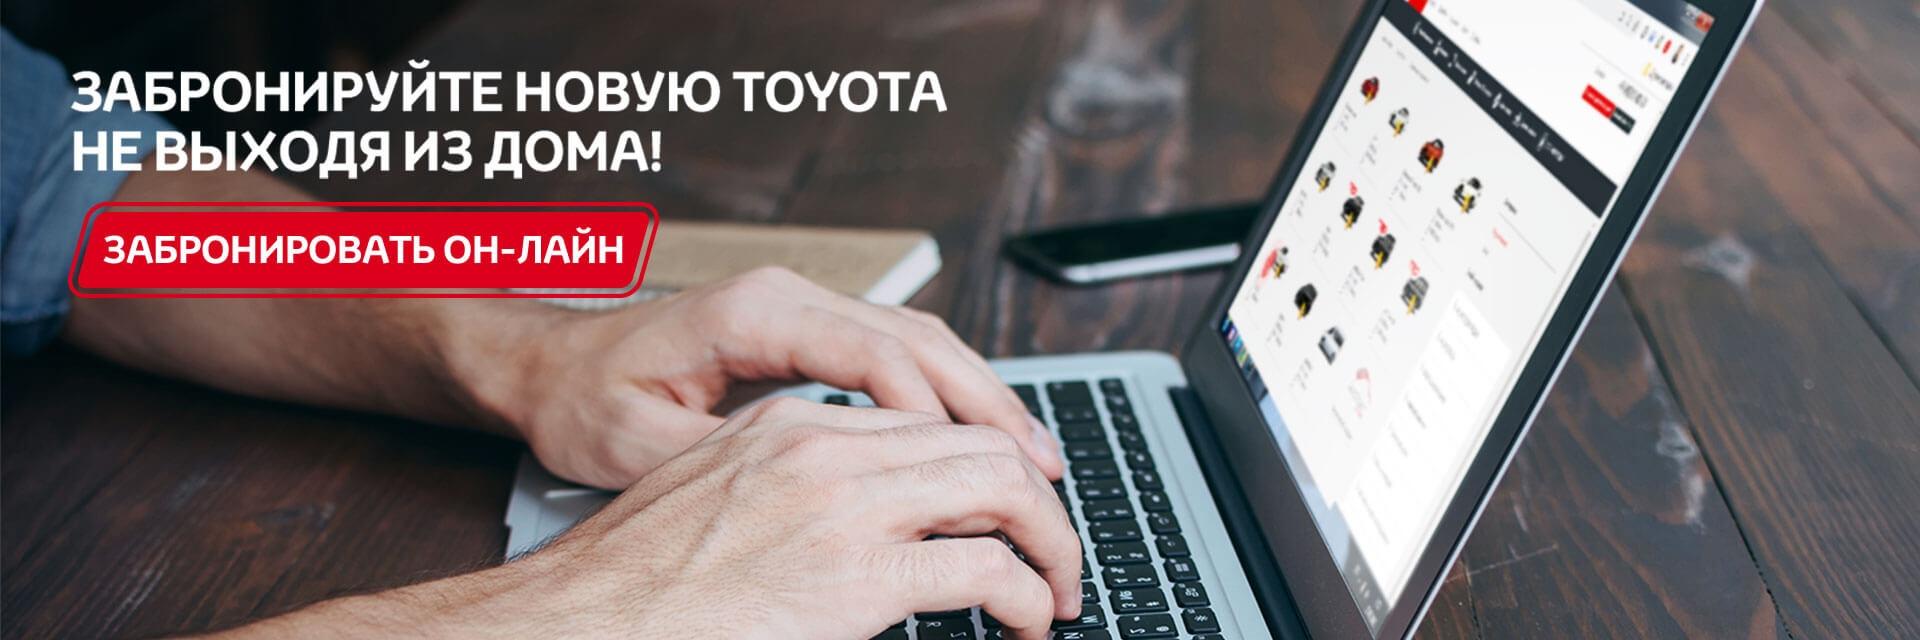 Toyota-week